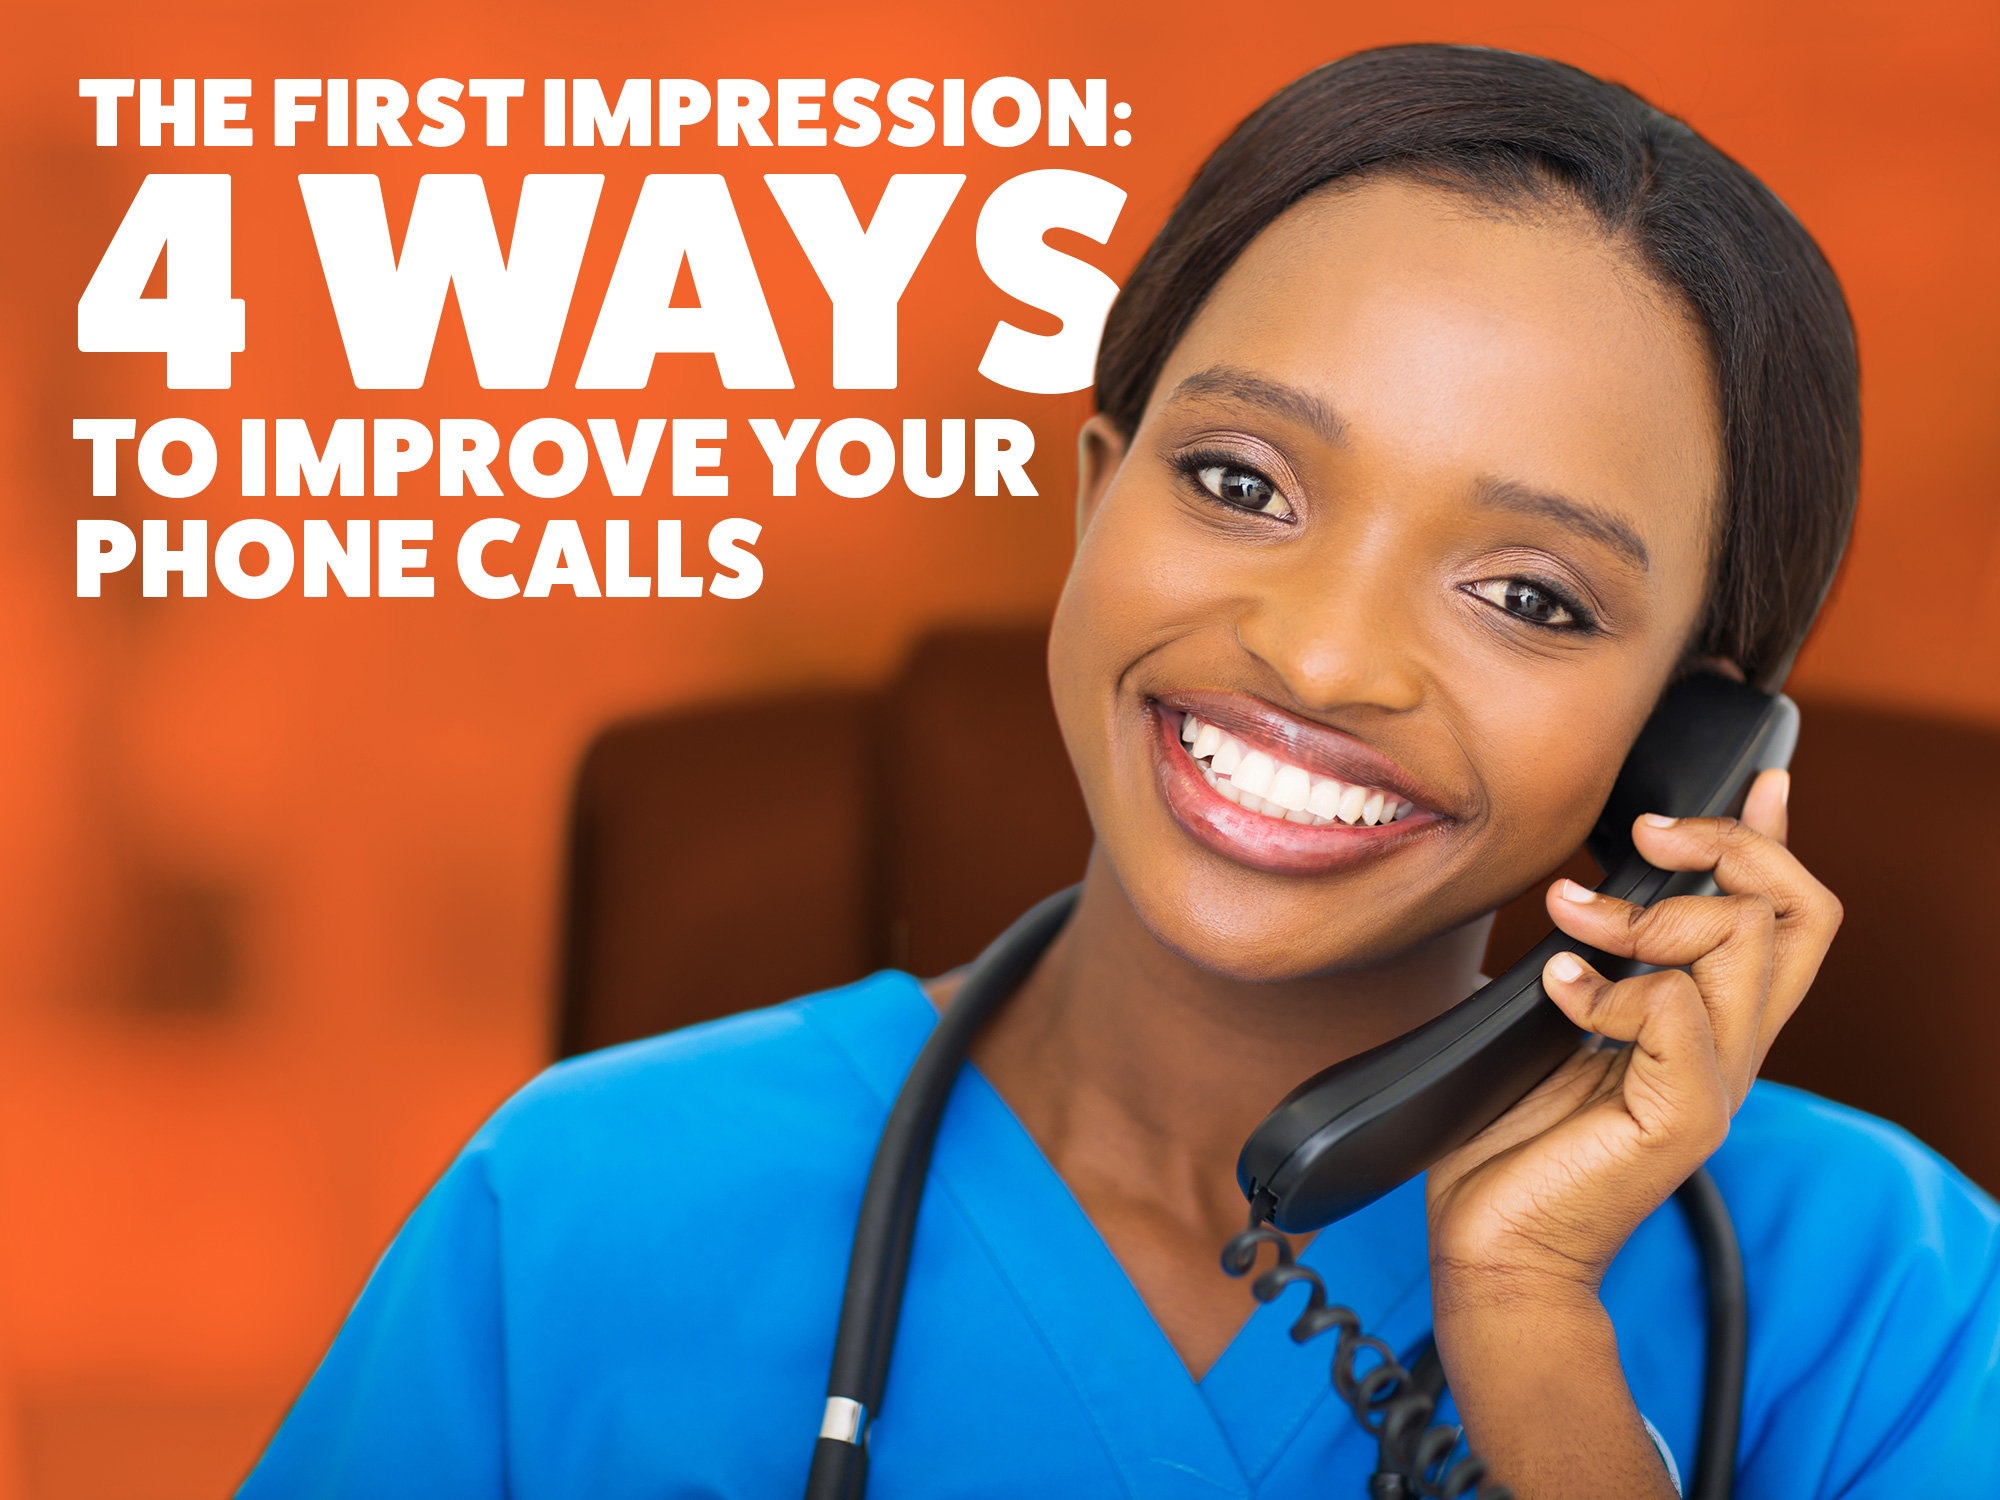 4-ways-to-improve-your-phone-calls